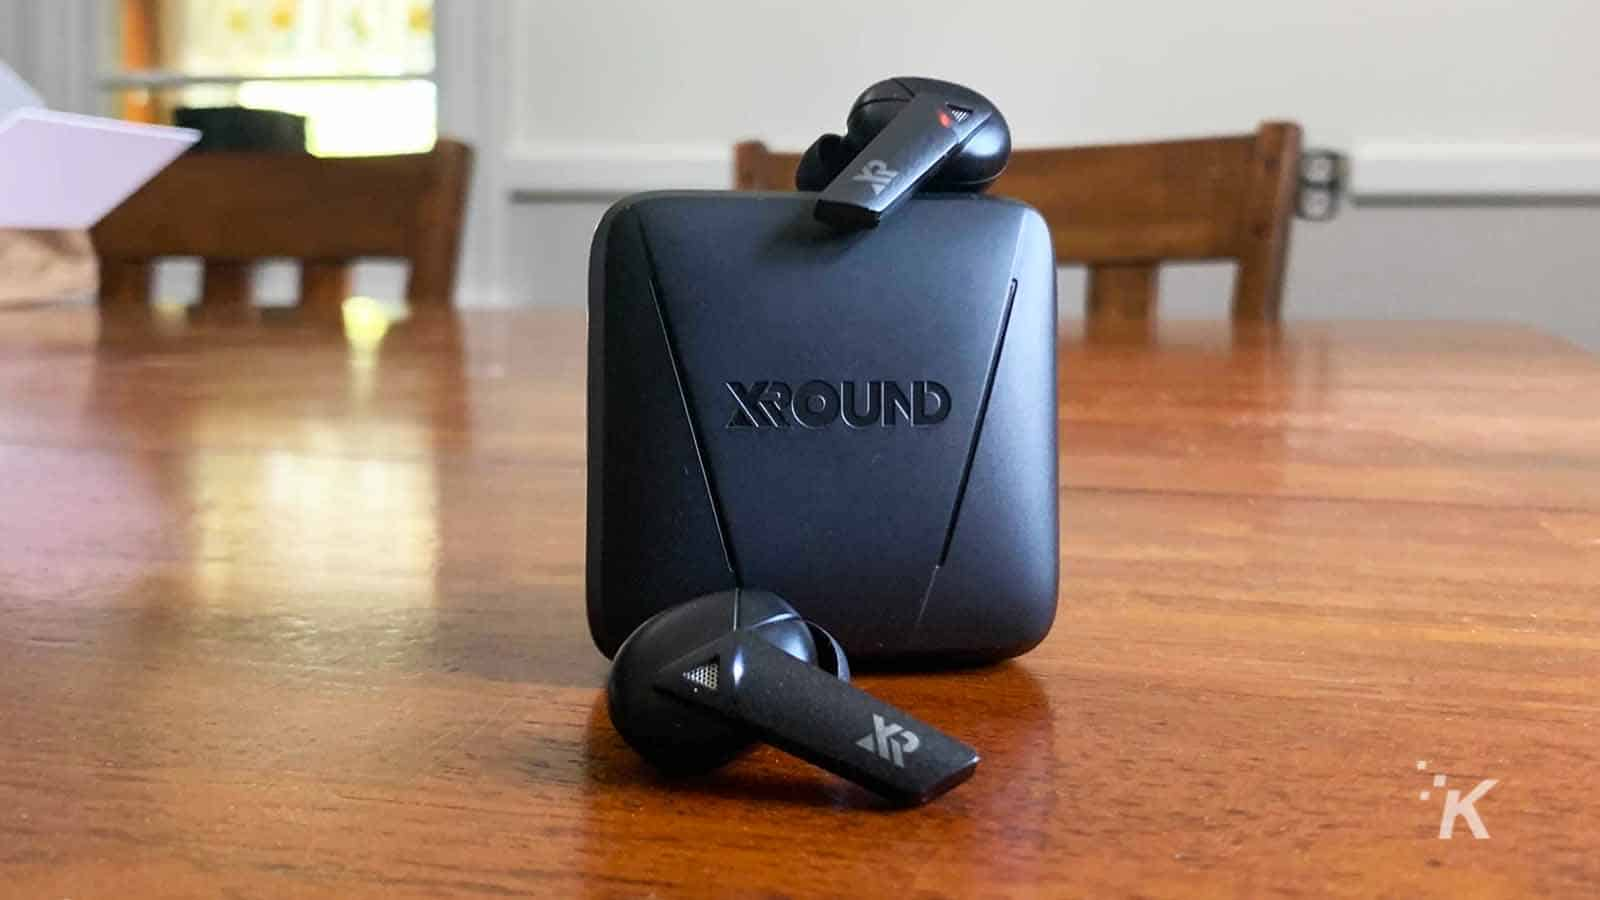 xround aero earbuds on table